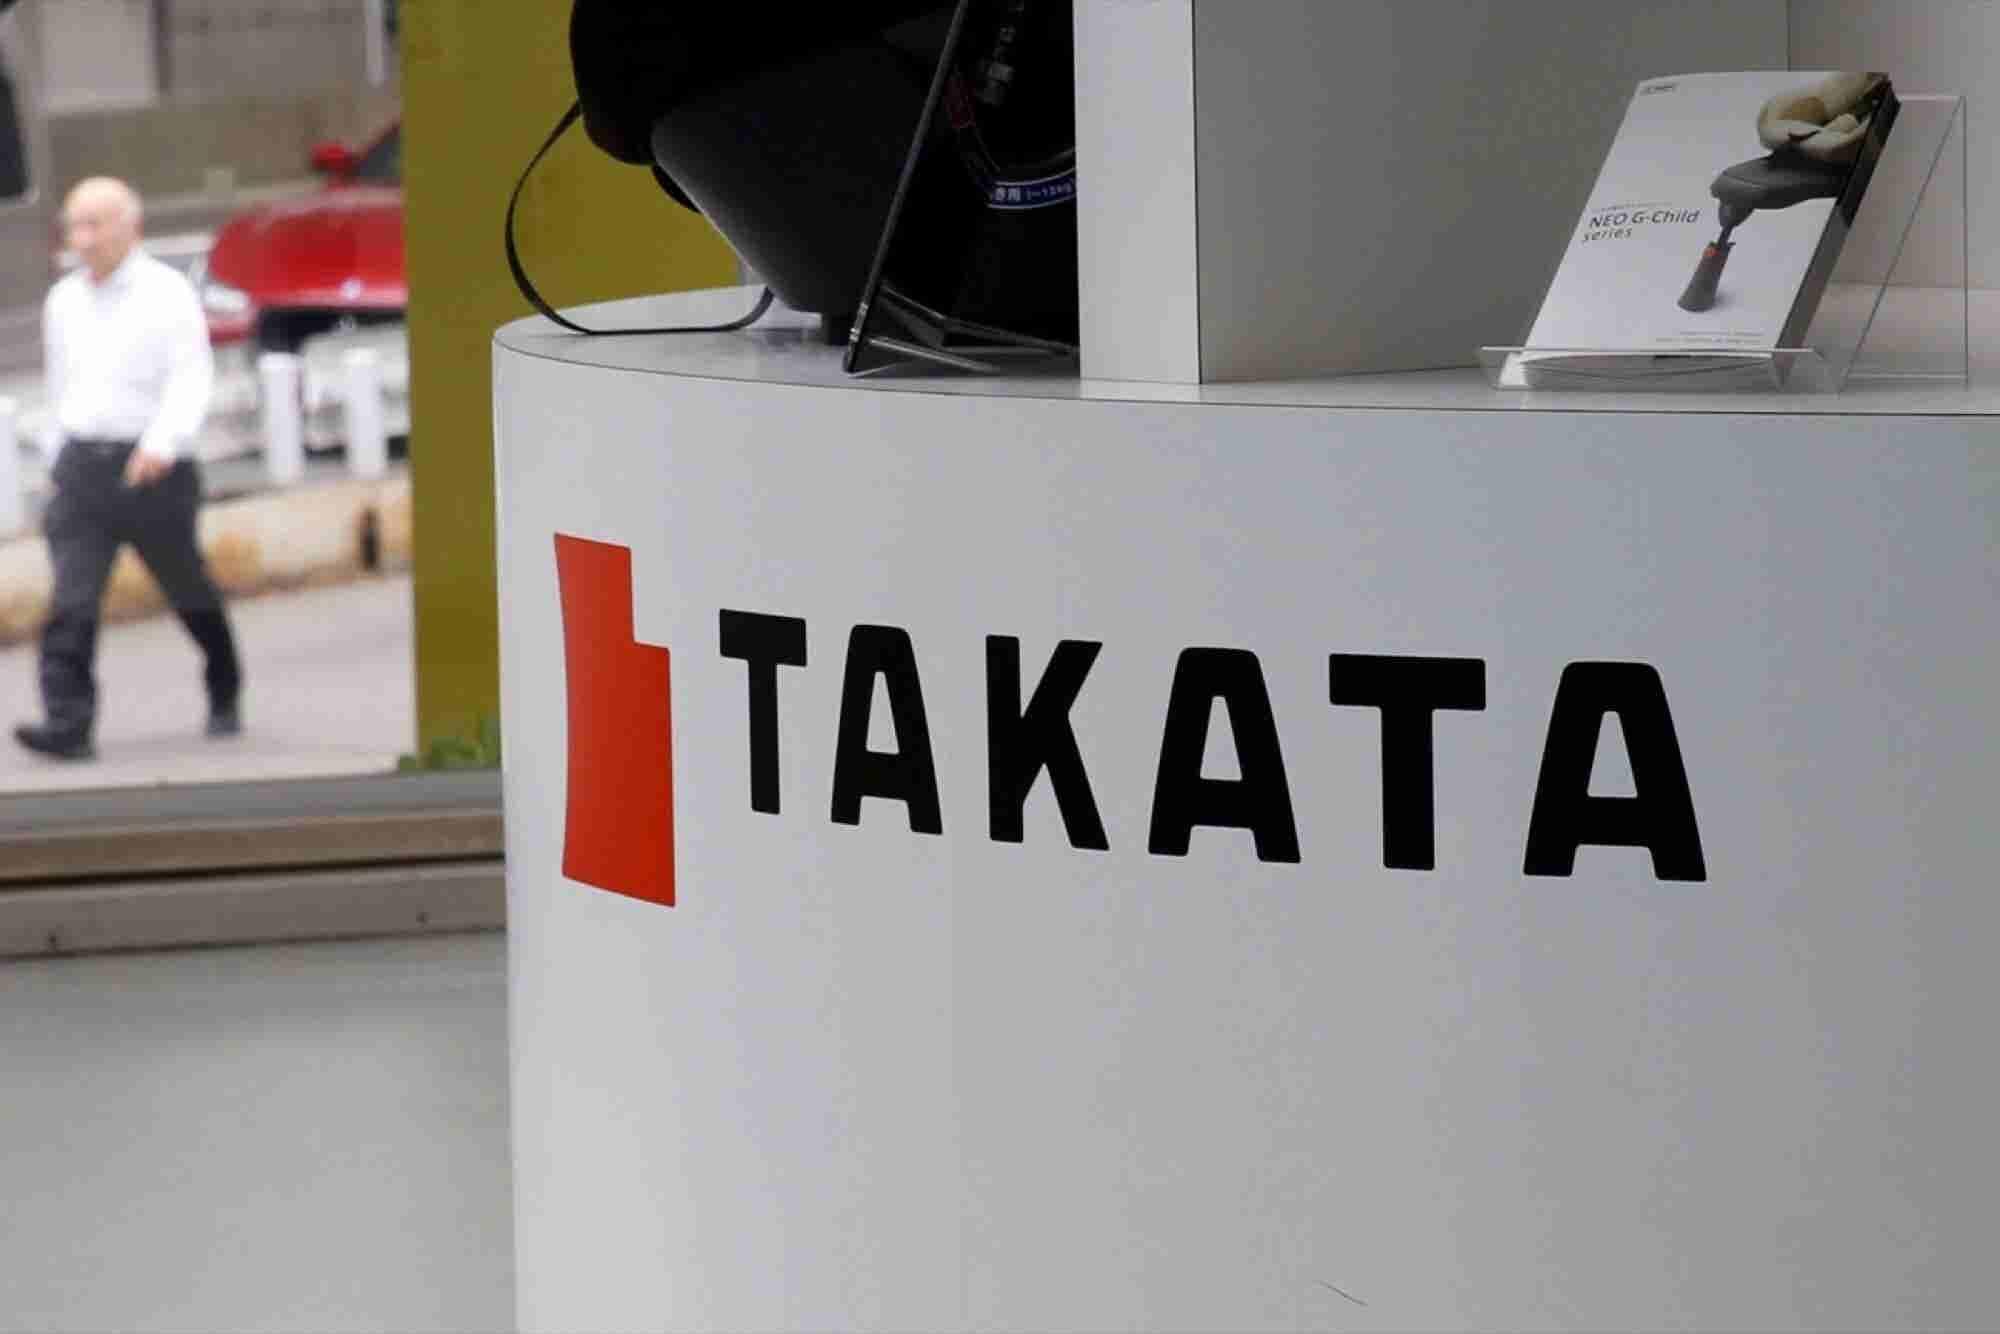 Toyota Recalls 1.6 Million U.S. Vehicles for Takata Air Bags